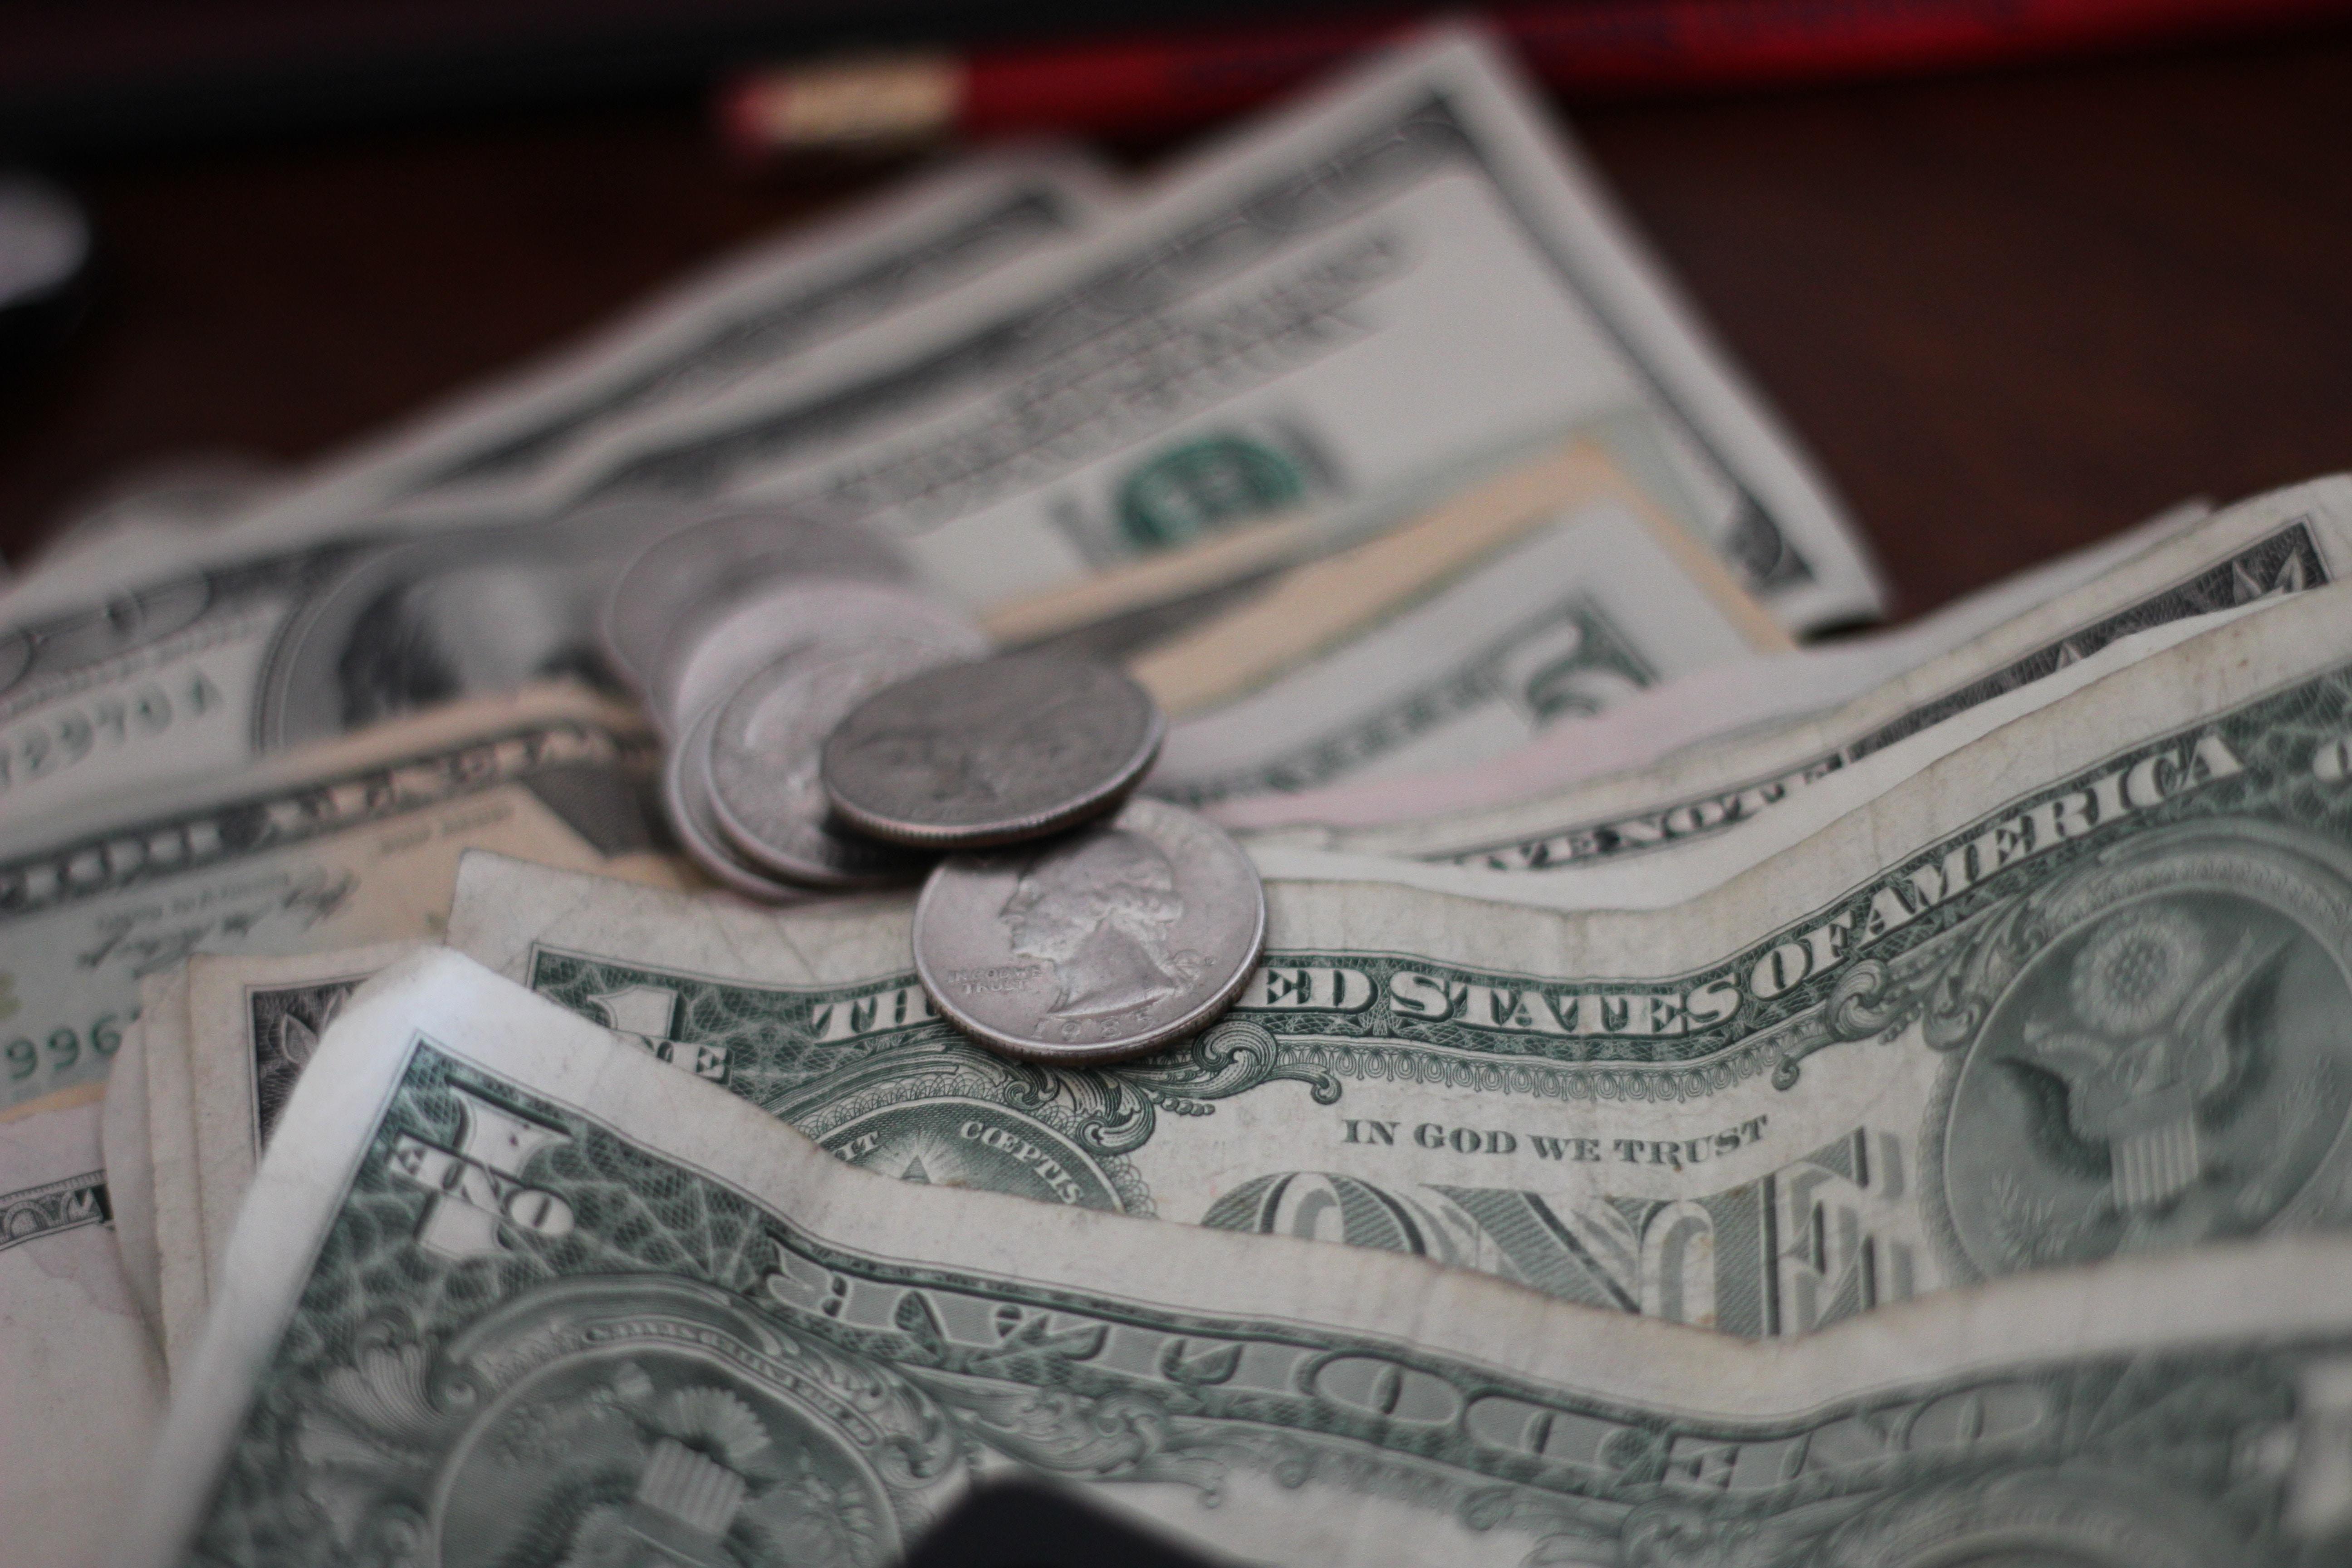 money - 2nd aspect of a transaction